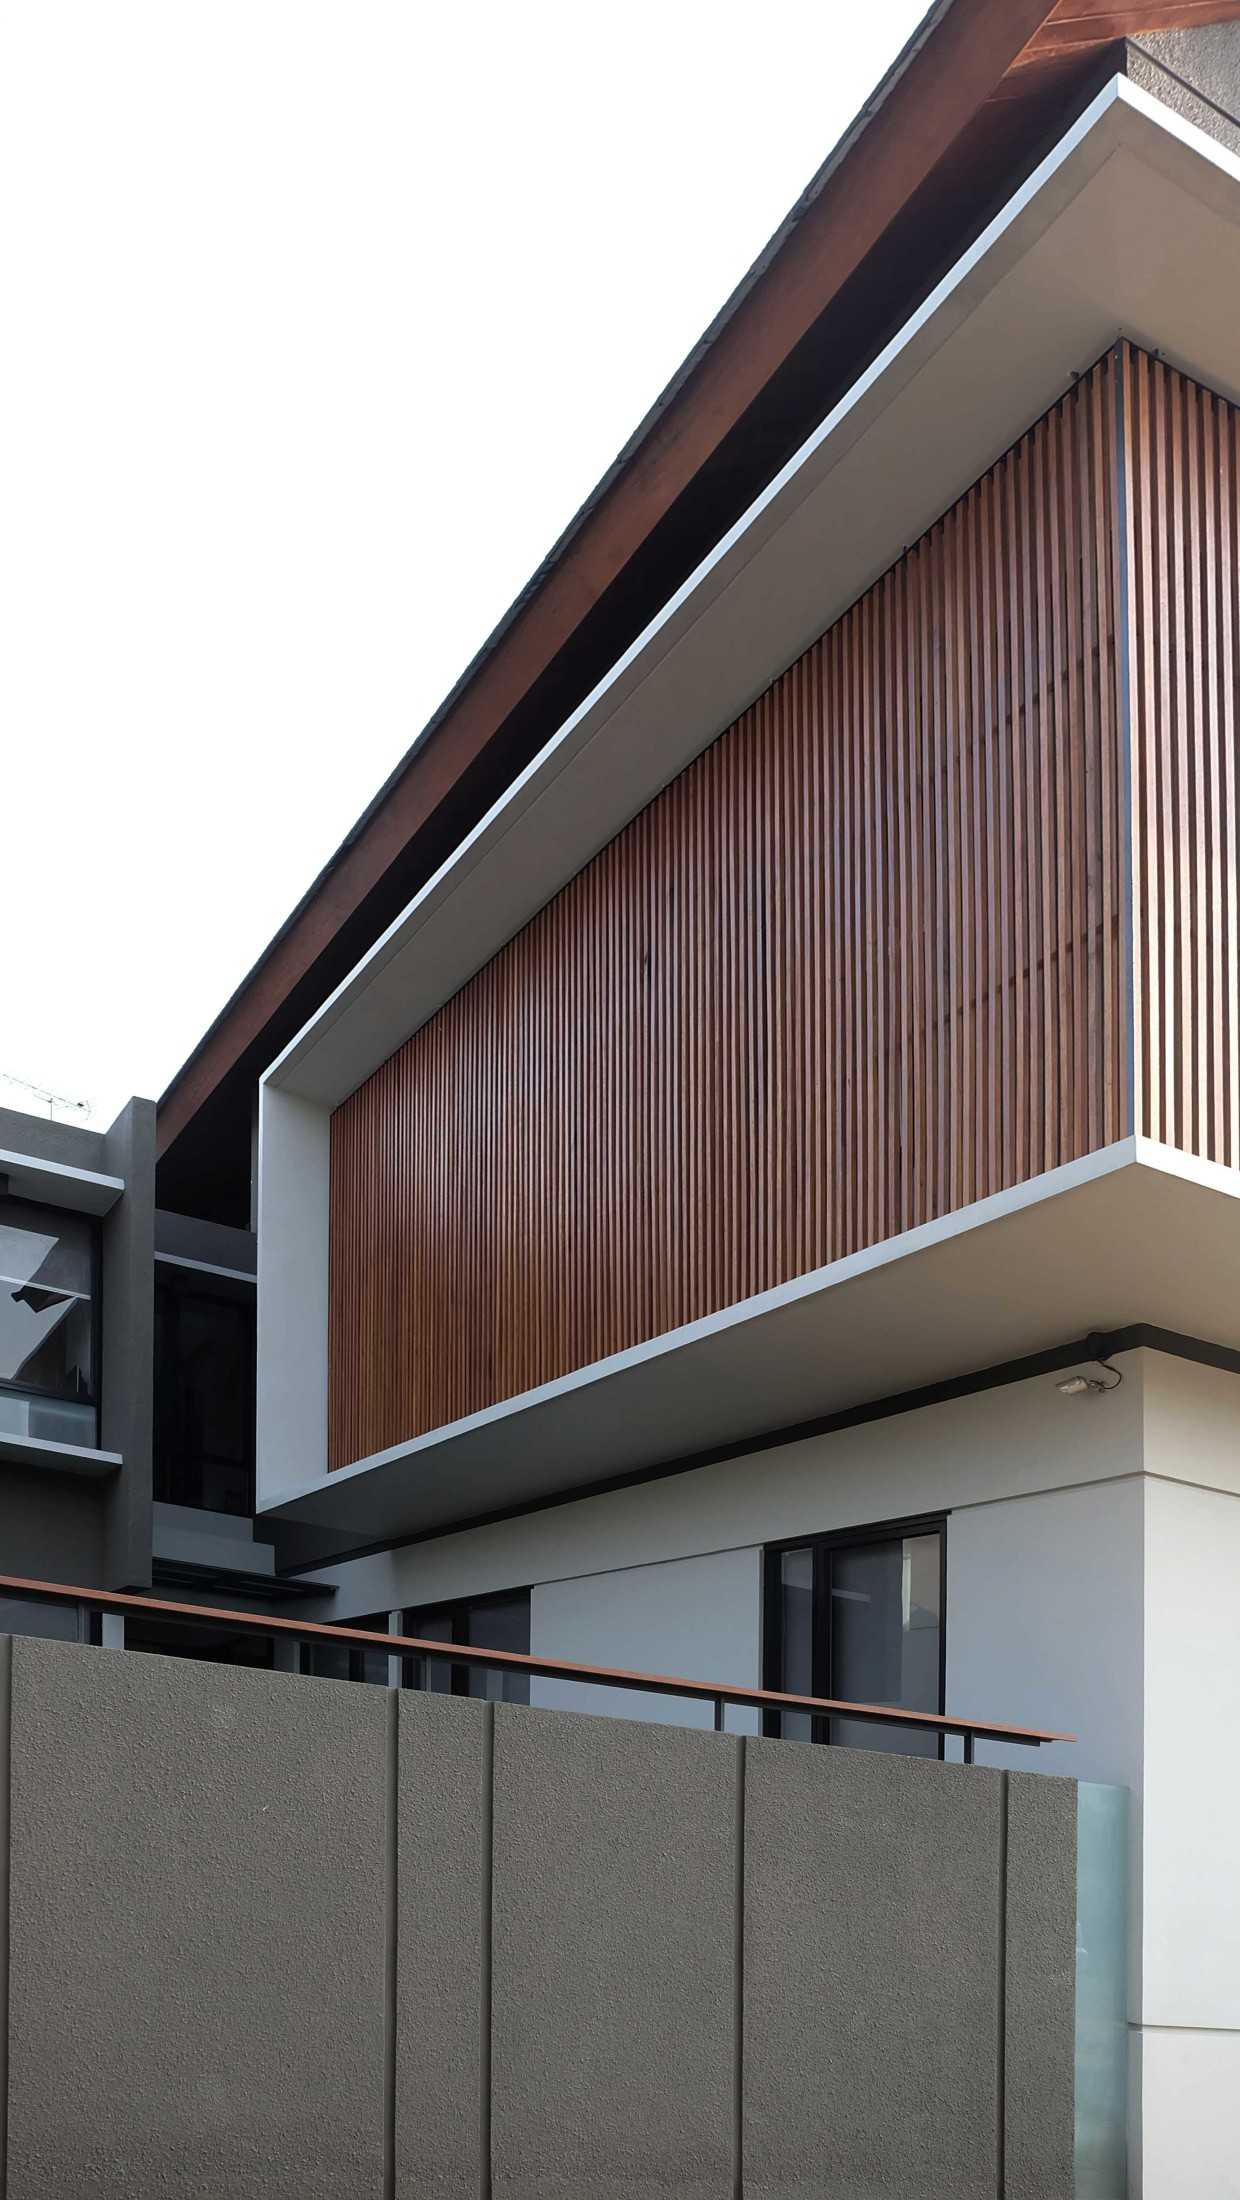 Gohte Architects Vk Homes Lippo Karawaci, Binong, Kec. Curug, Tangerang, Banten, Indonesia Lippo Karawaci, Binong, Kec. Curug, Tangerang, Banten, Indonesia Gohte-Architects-Vk-Homes  96621